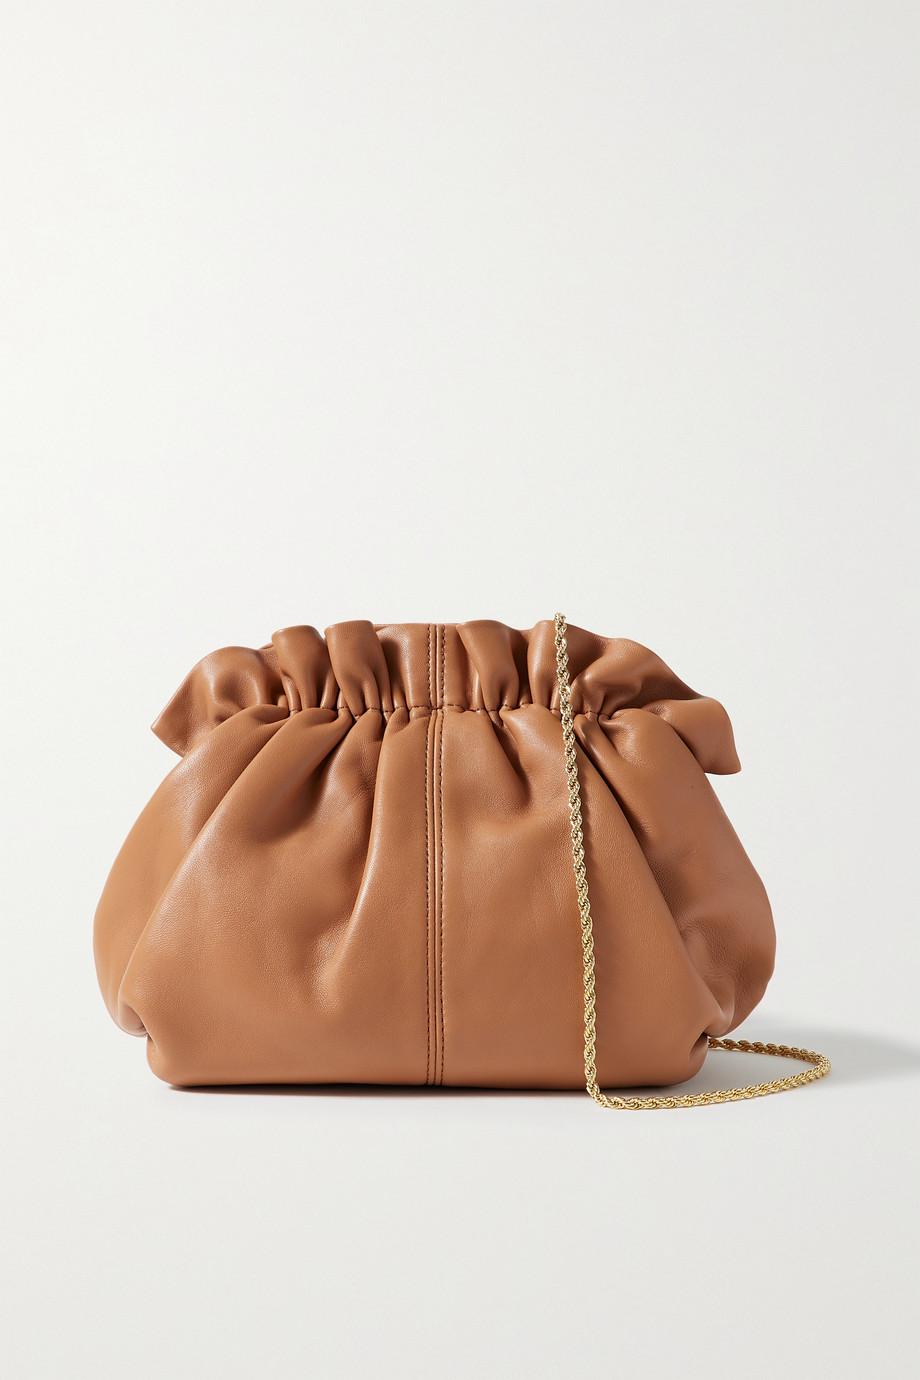 Loeffler Randall Willa mini ruched leather clutch